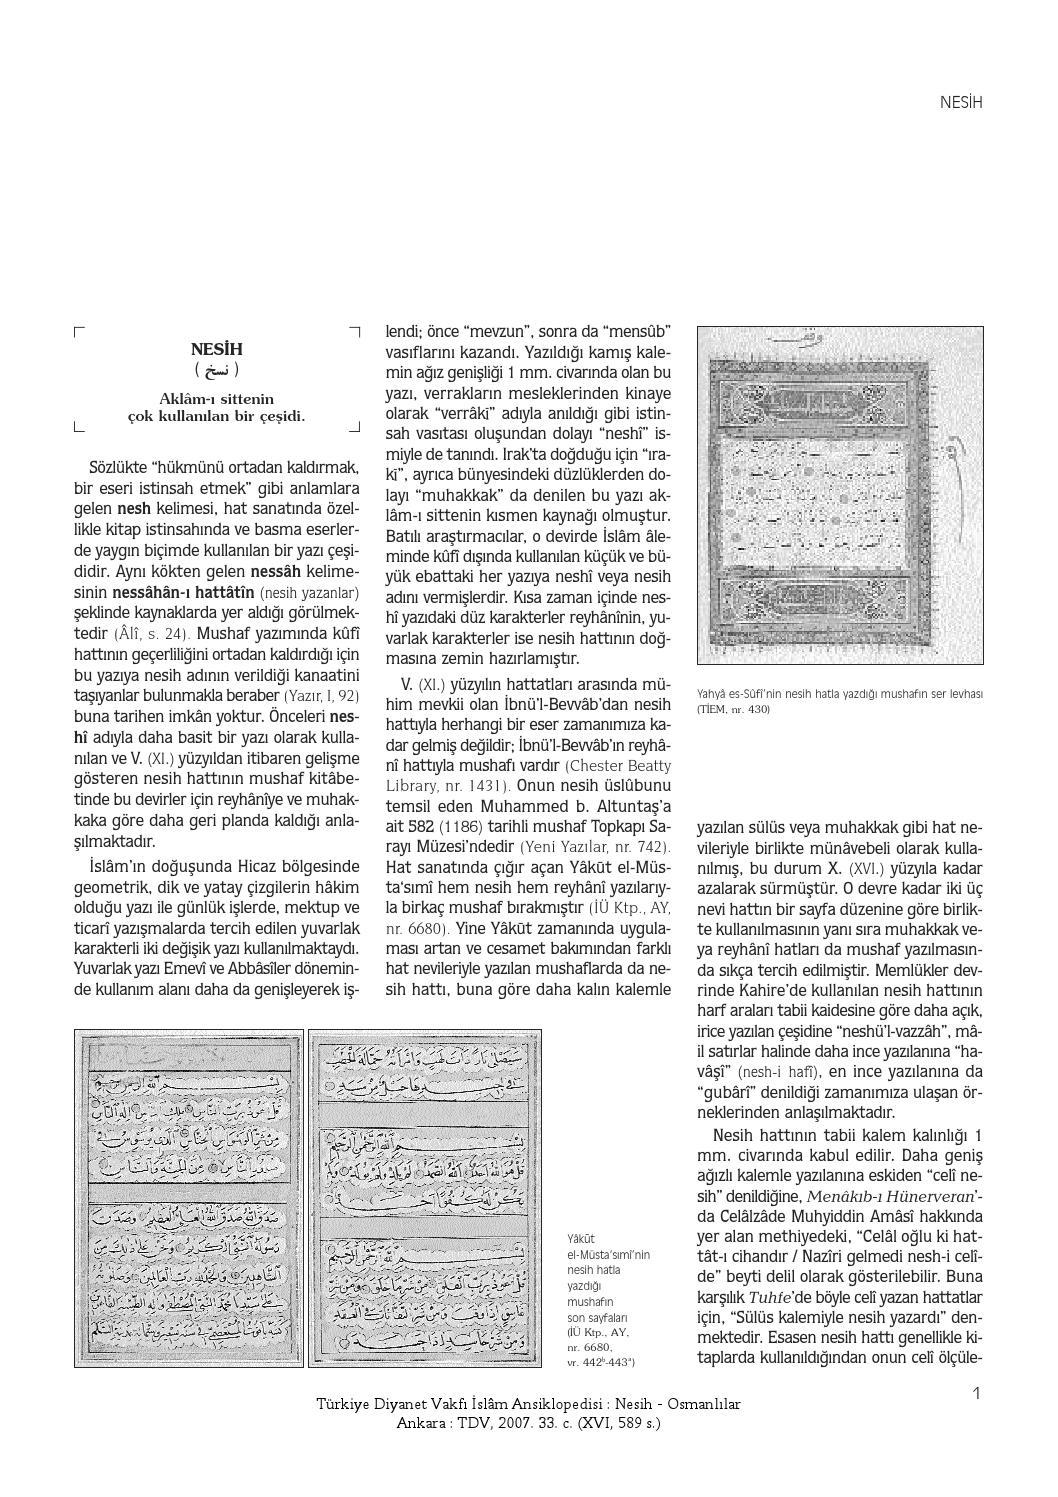 Islam Ansiklopedisi 33 1 250 By Salih Cepoglu Issuu